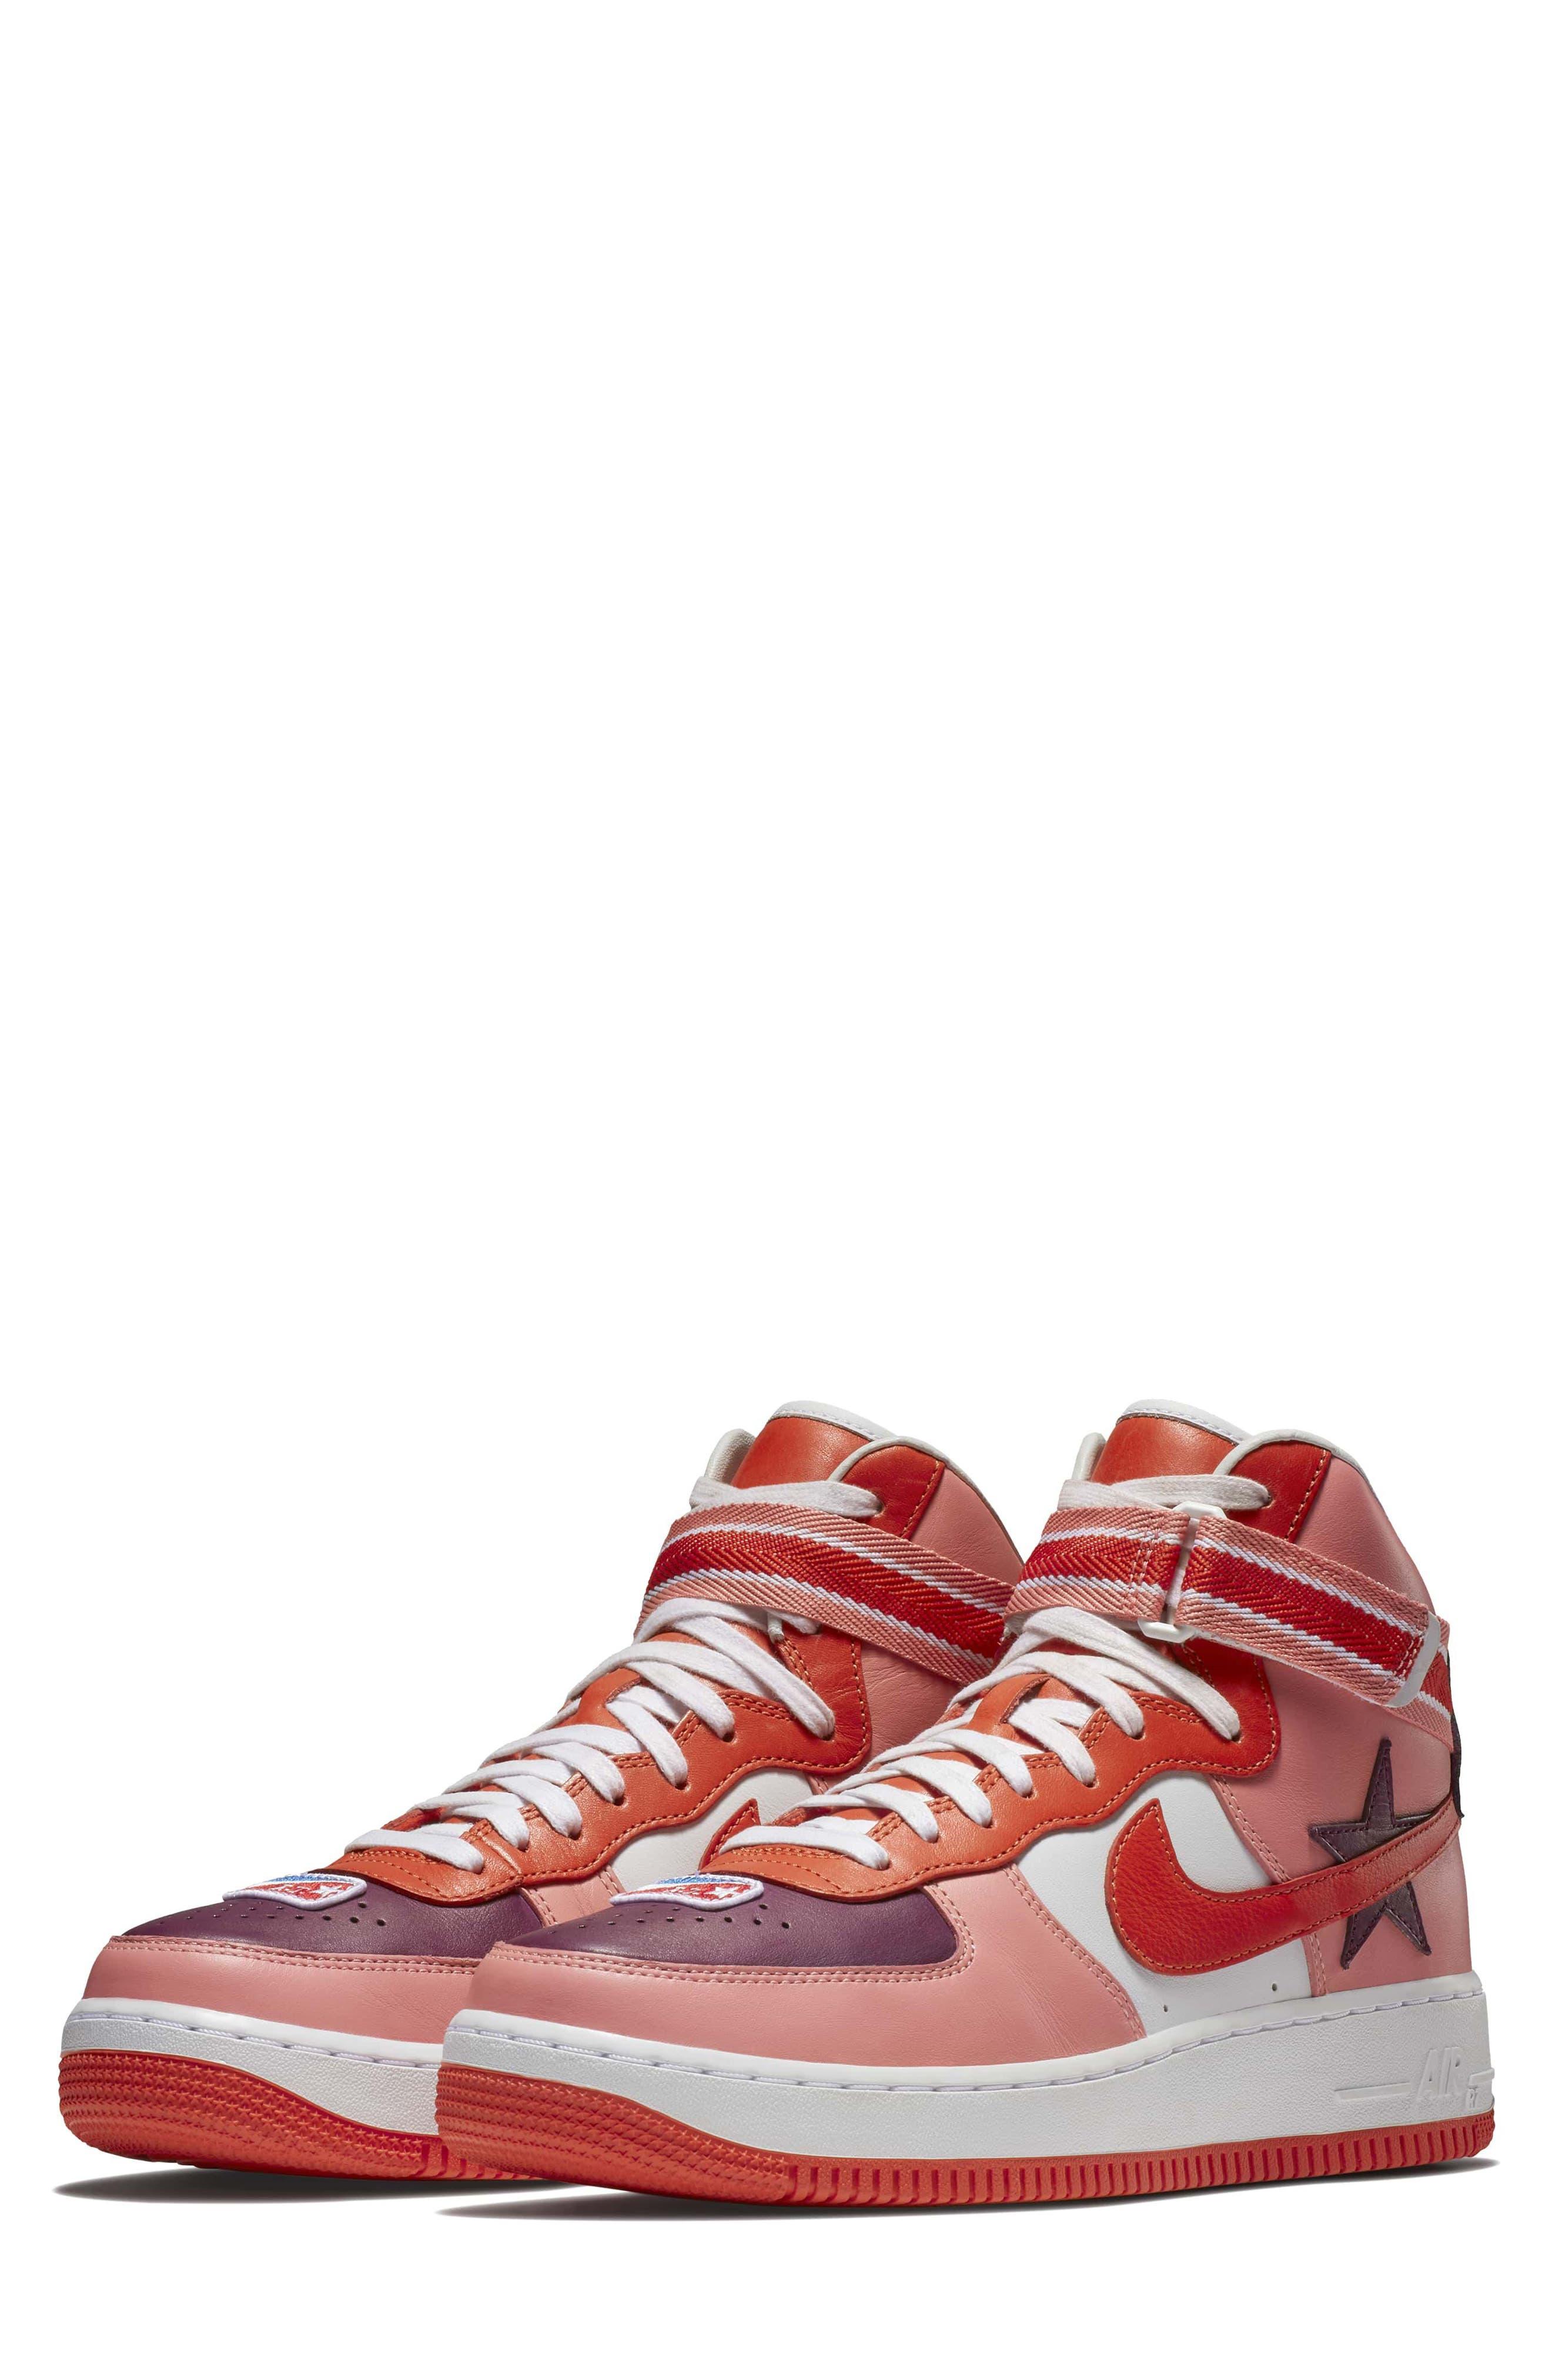 Air Force 1 High RT Sneaker,                         Main,                         color, Coral/ Bordeax/ Orange/ Black